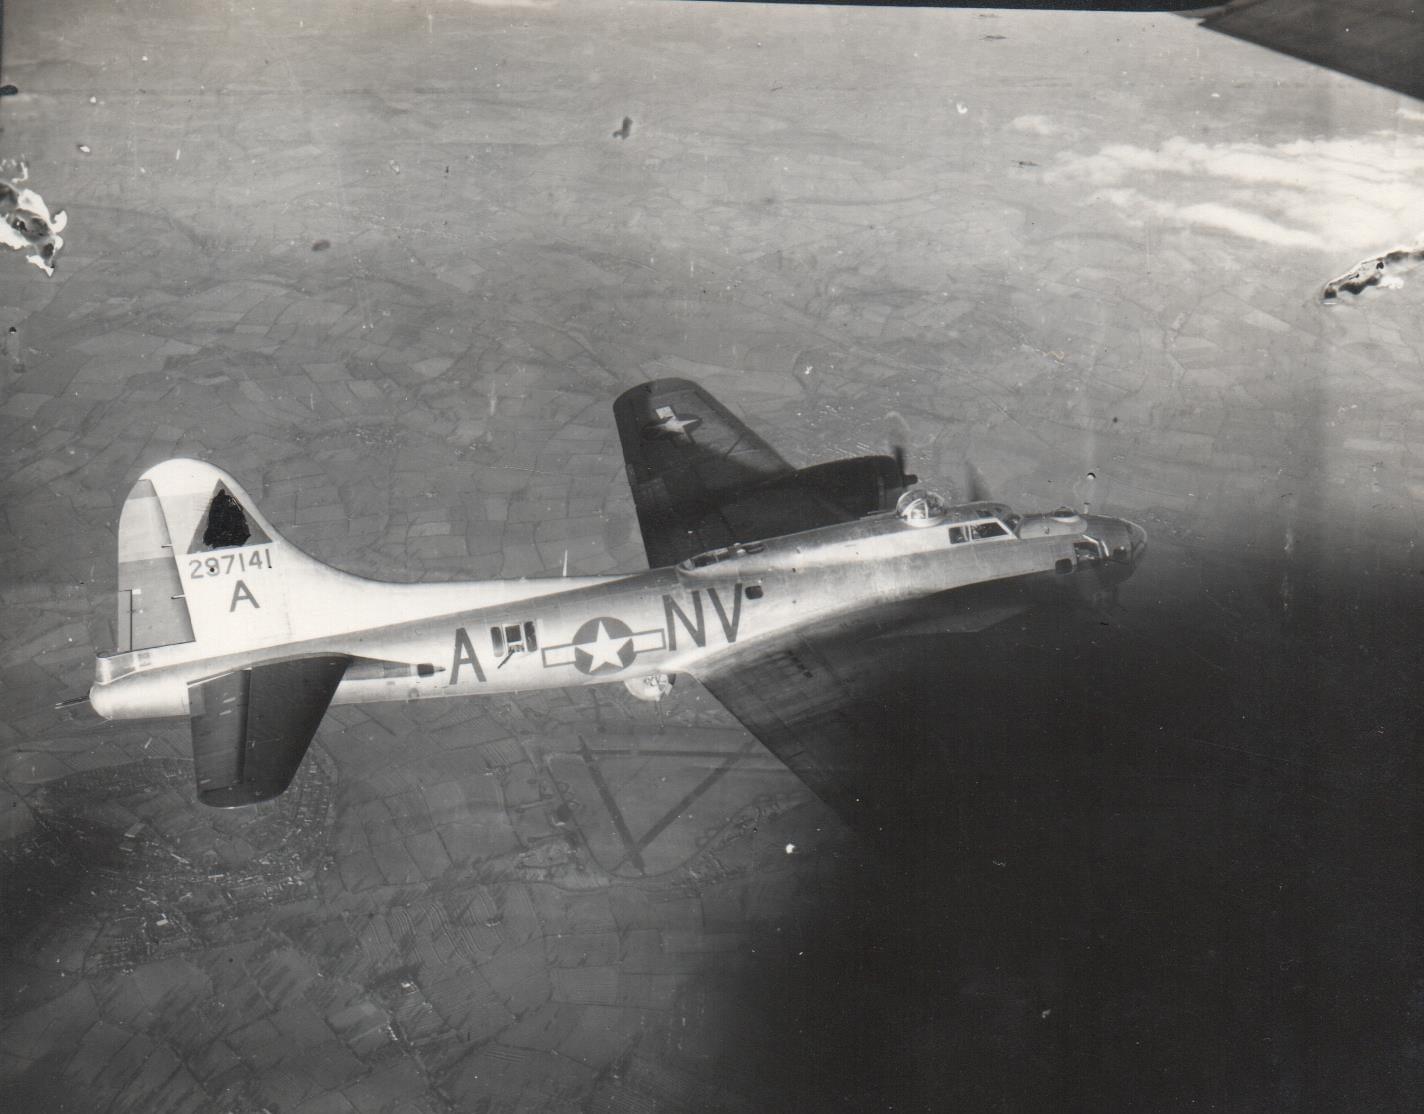 B-17 42-97141